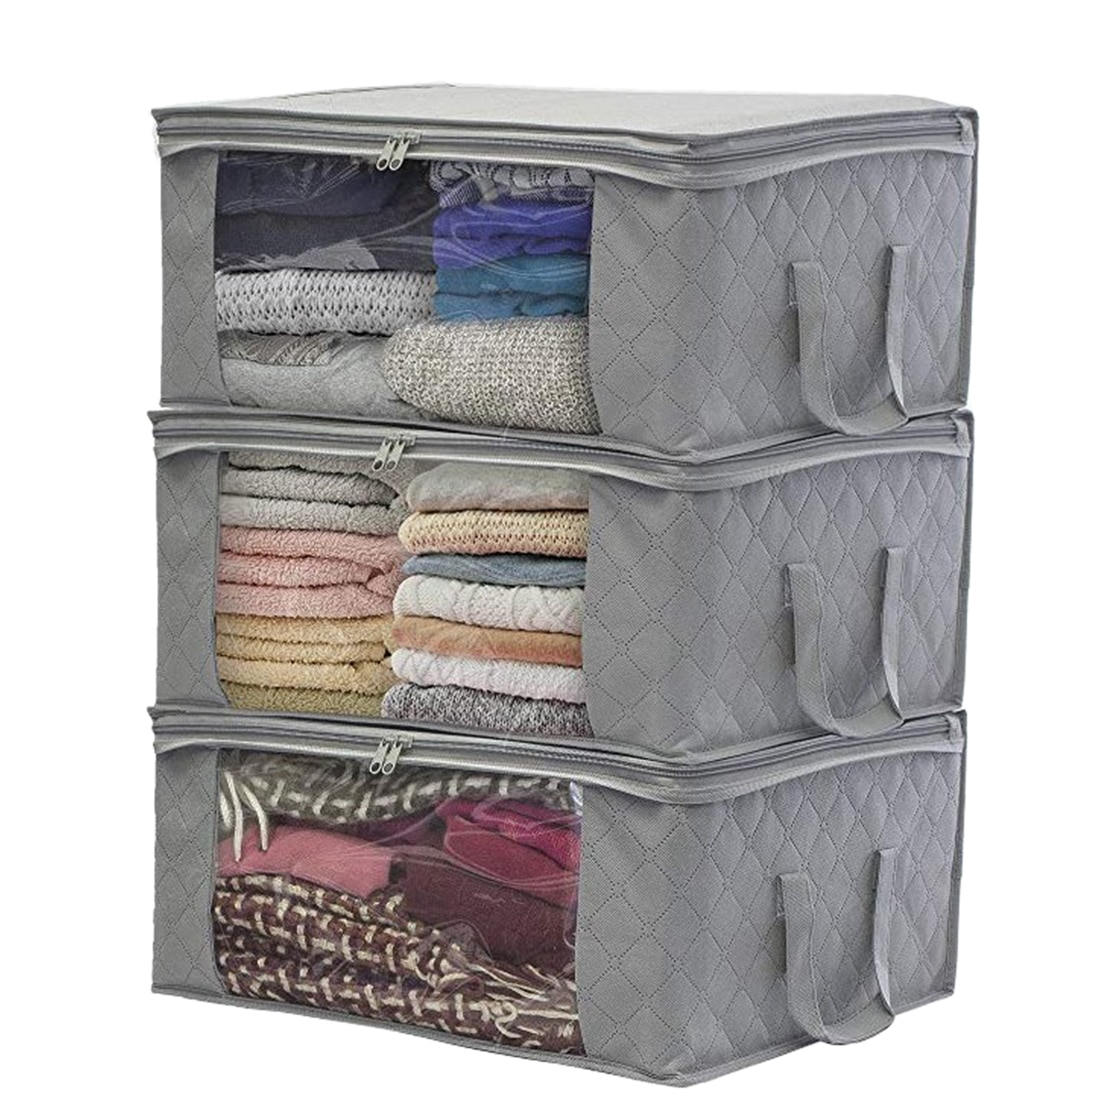 1/3 Uds. Organizador de ropa portátil no tejido, bolsa organizadora, bolsa organizadora, caja de almacenamiento para el hogar, bolsa contenedora de almacenamiento para colcha, gris